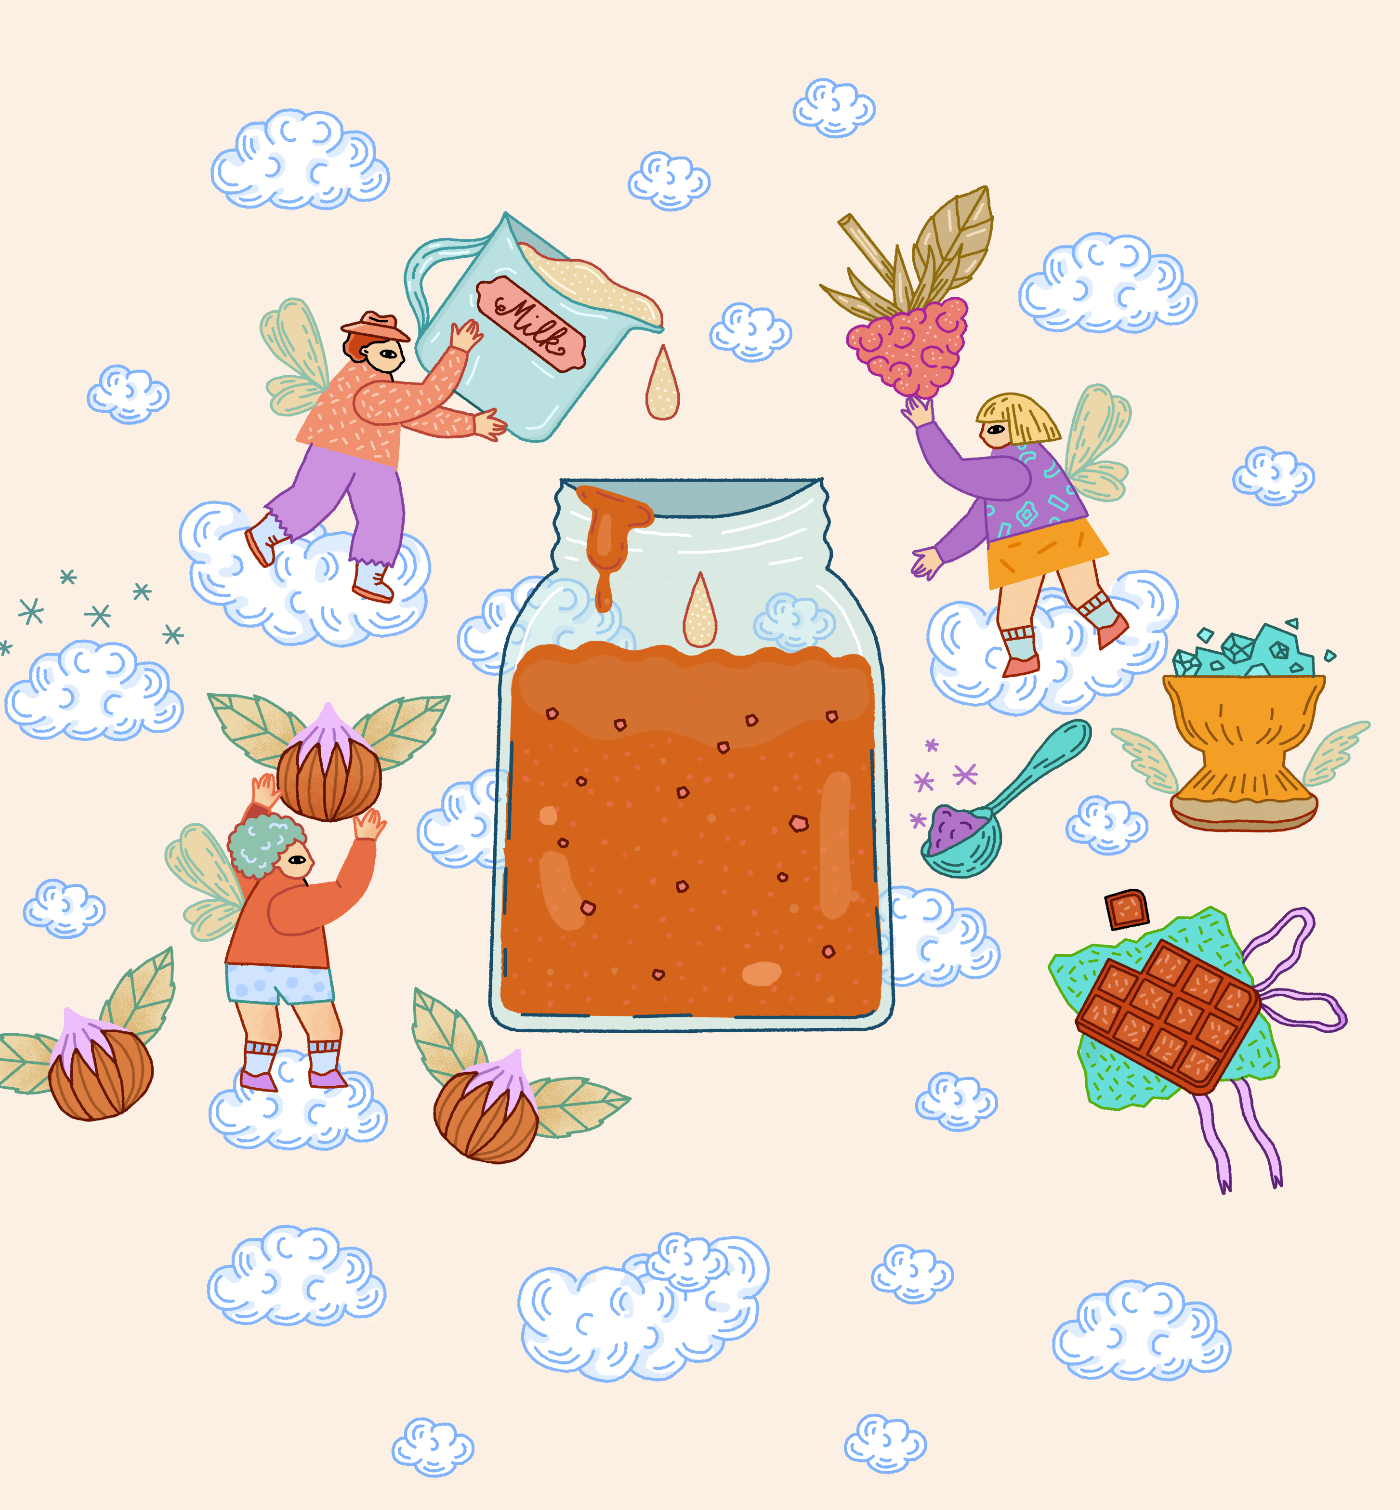 caramel eco illustration  food illustration Food Packaging heaven